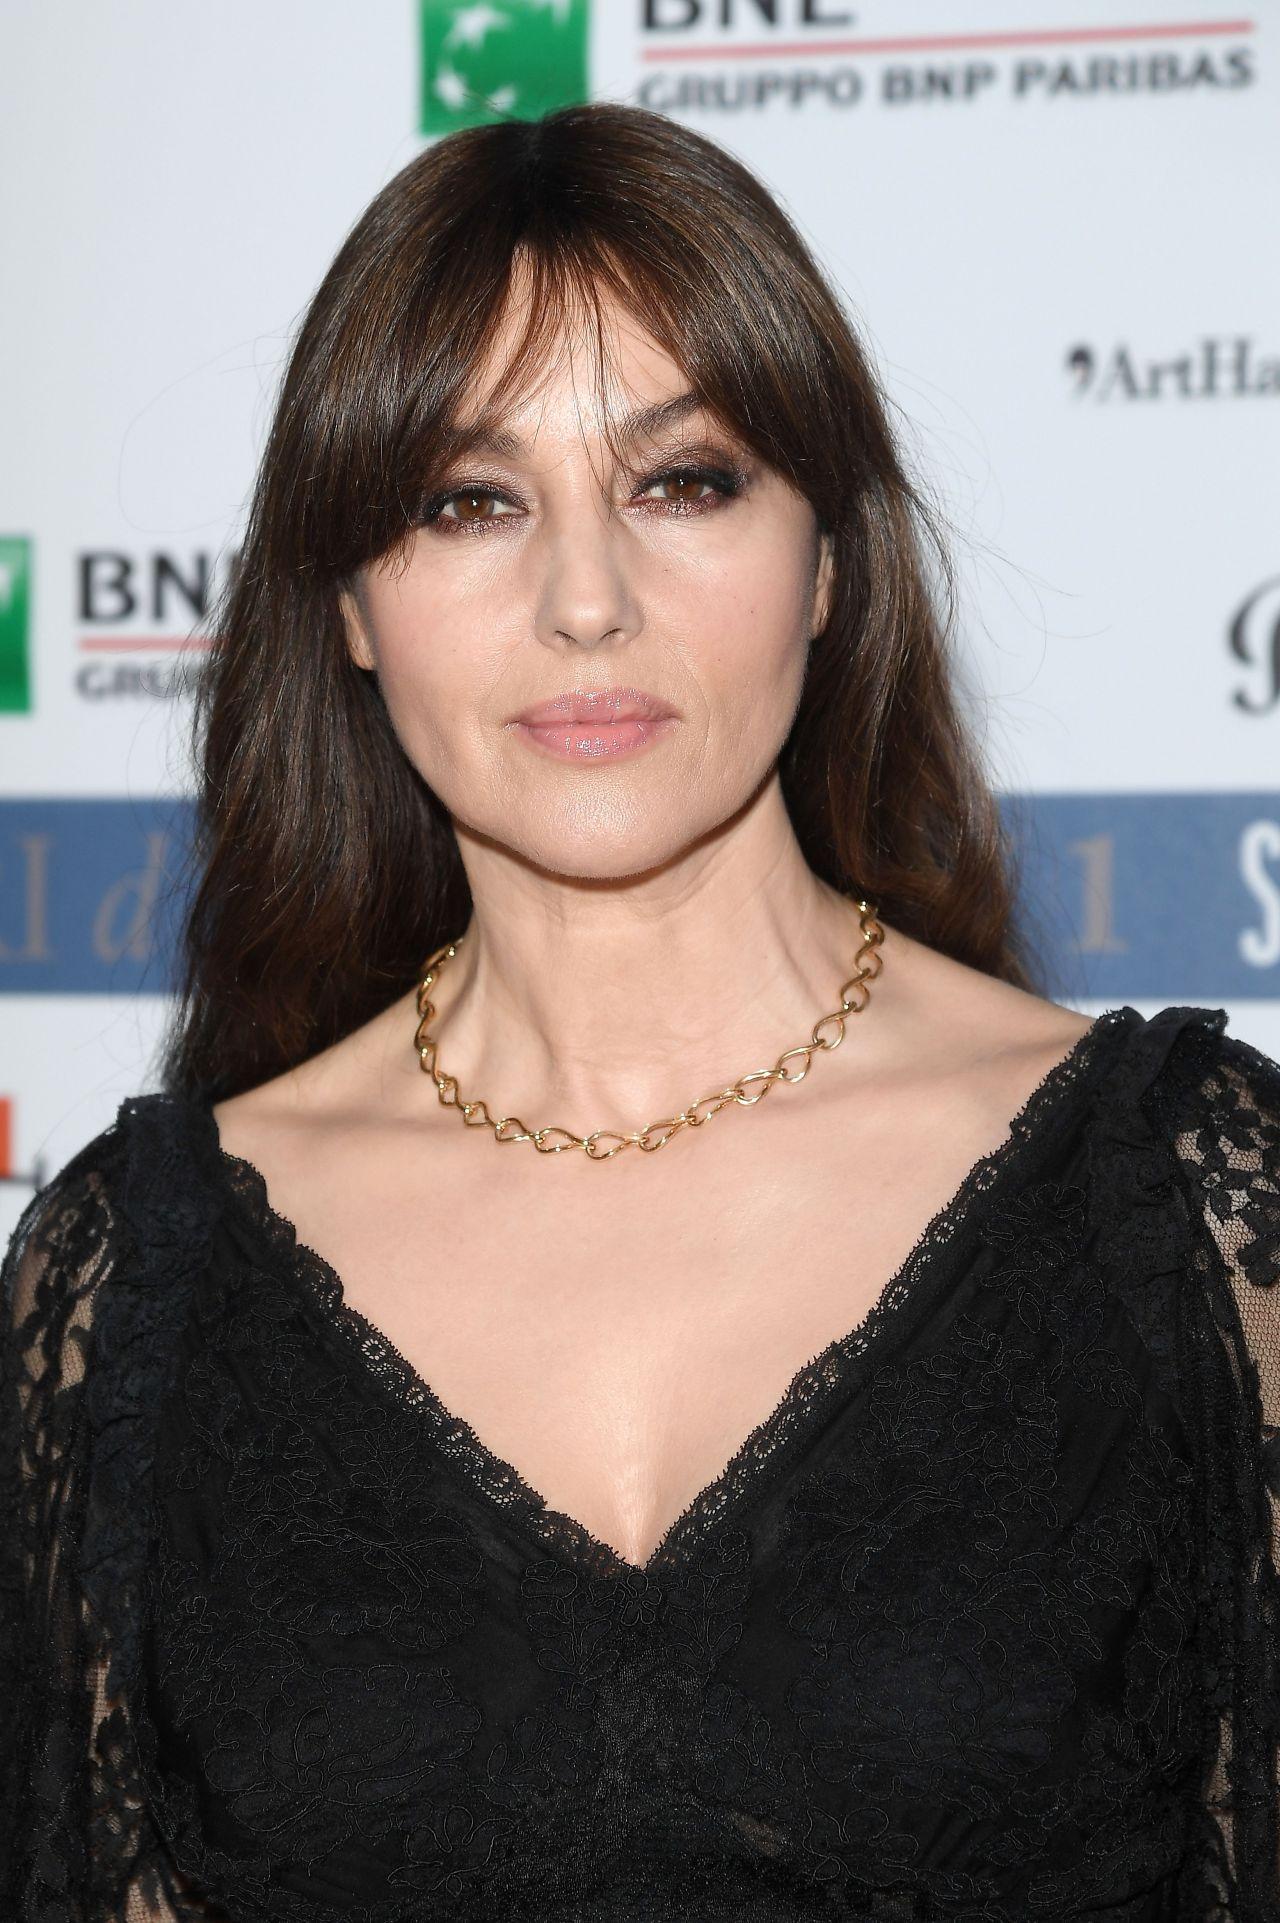 Monica Bellucci - Nastri D'Argento 2017 in Taormina, Italy ... Monica Bellucci